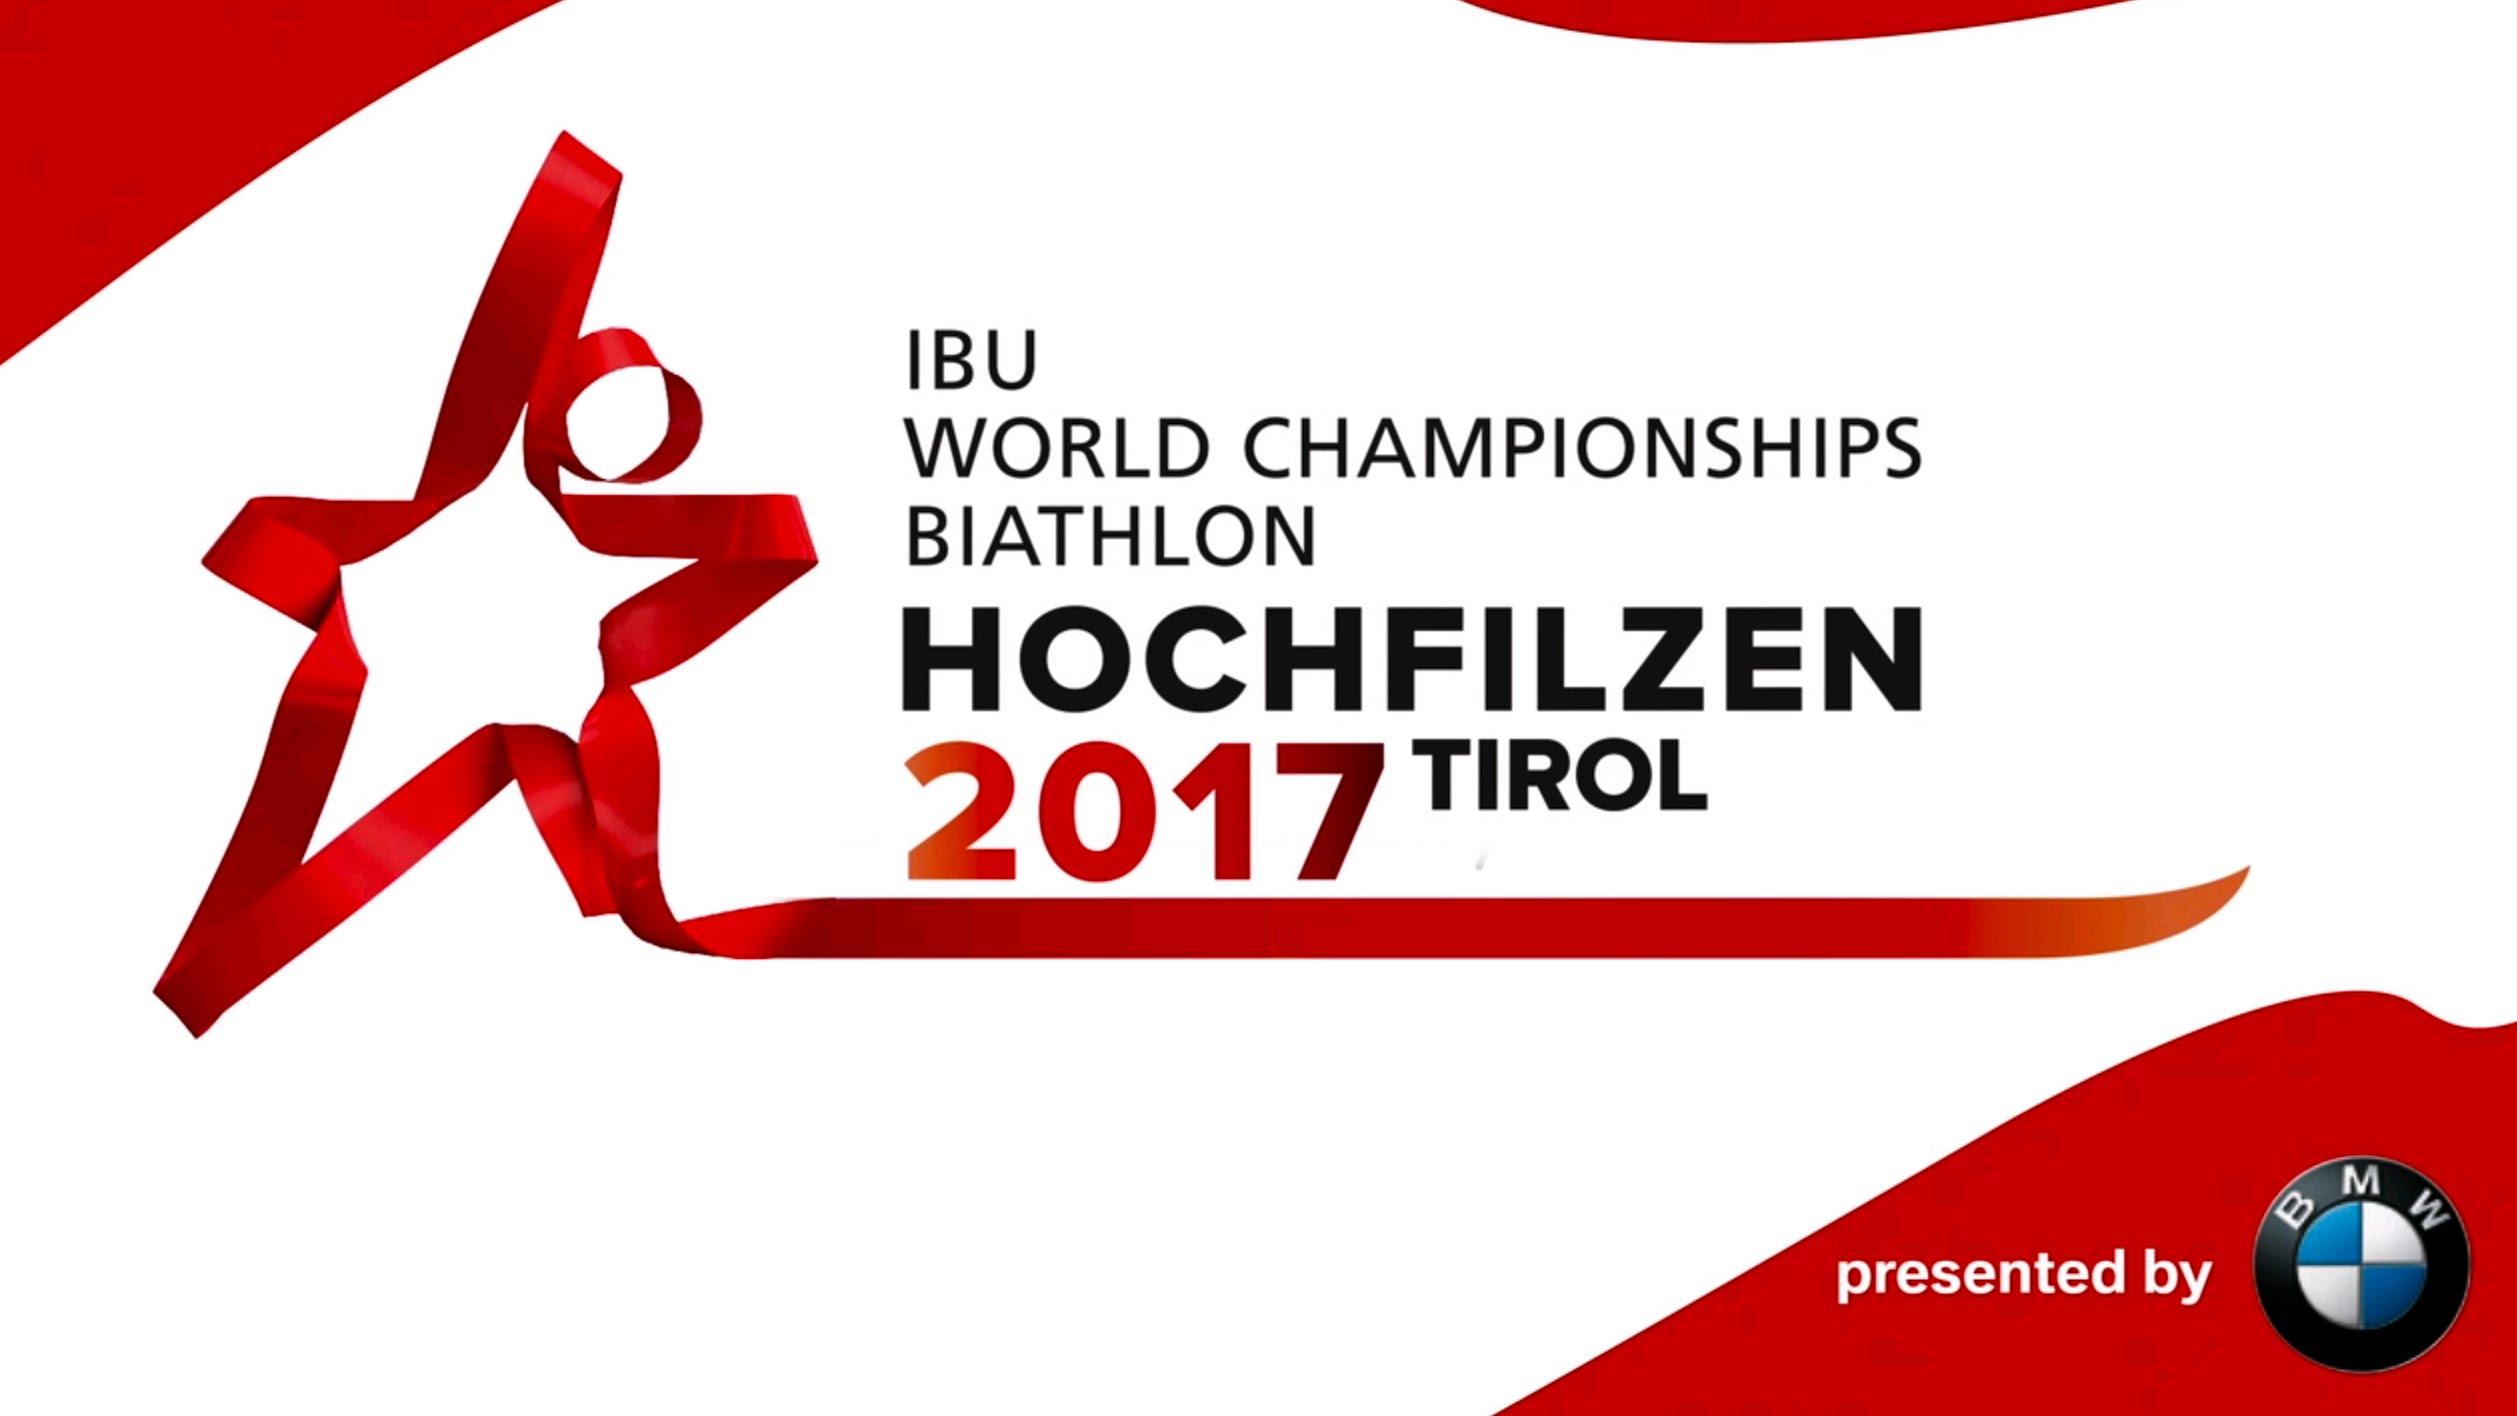 http://www.scifondo.eu/wp-content/uploads/2016/10/hochfilzen-2017-logo.jpg